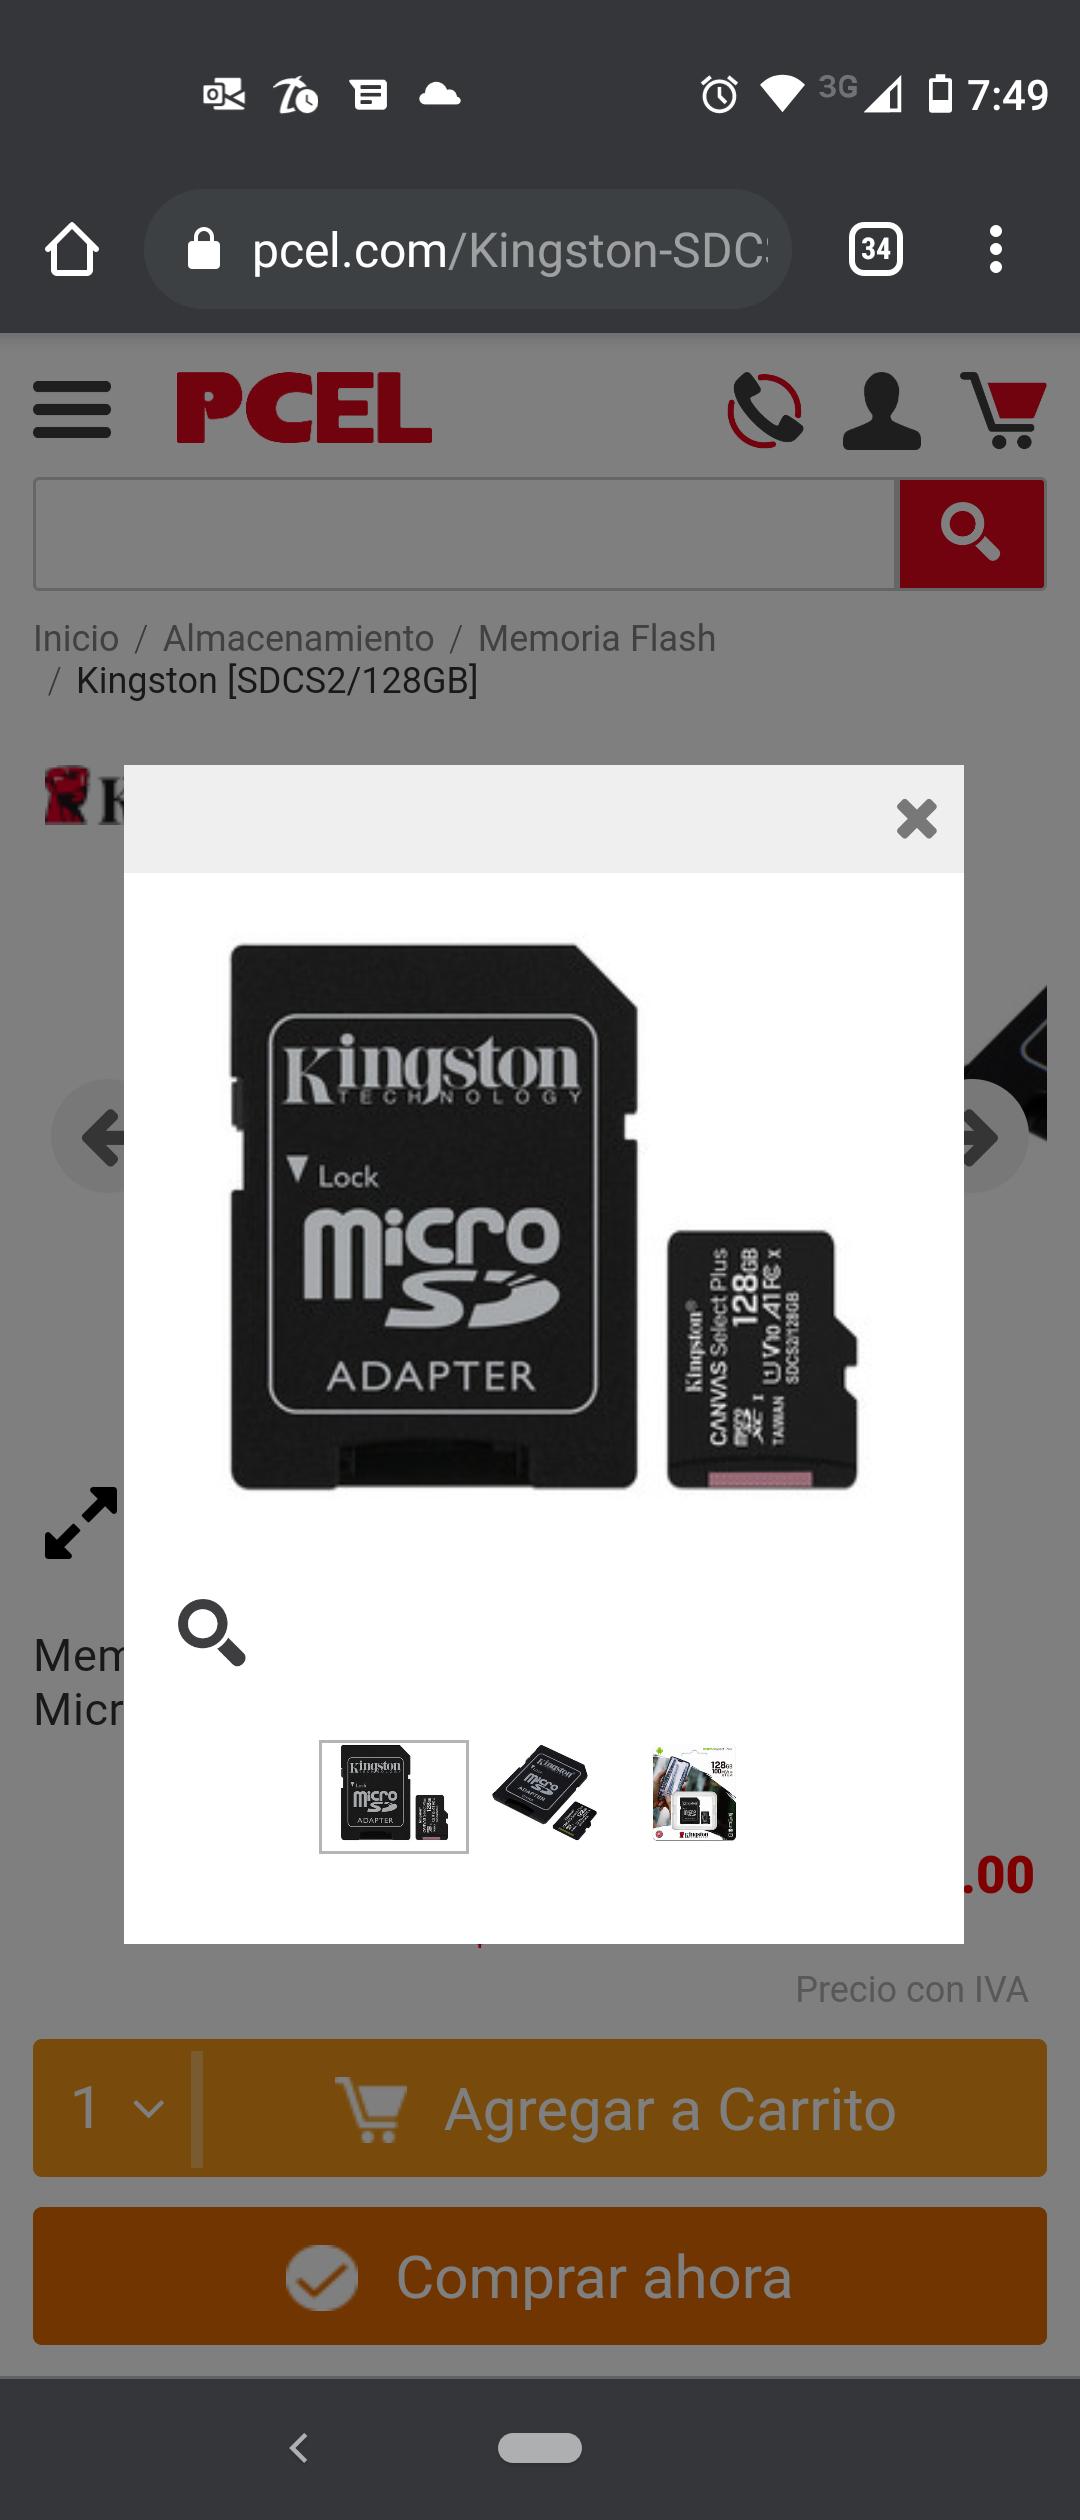 PCEL: Micro SD de 128gb Kingston U1 a